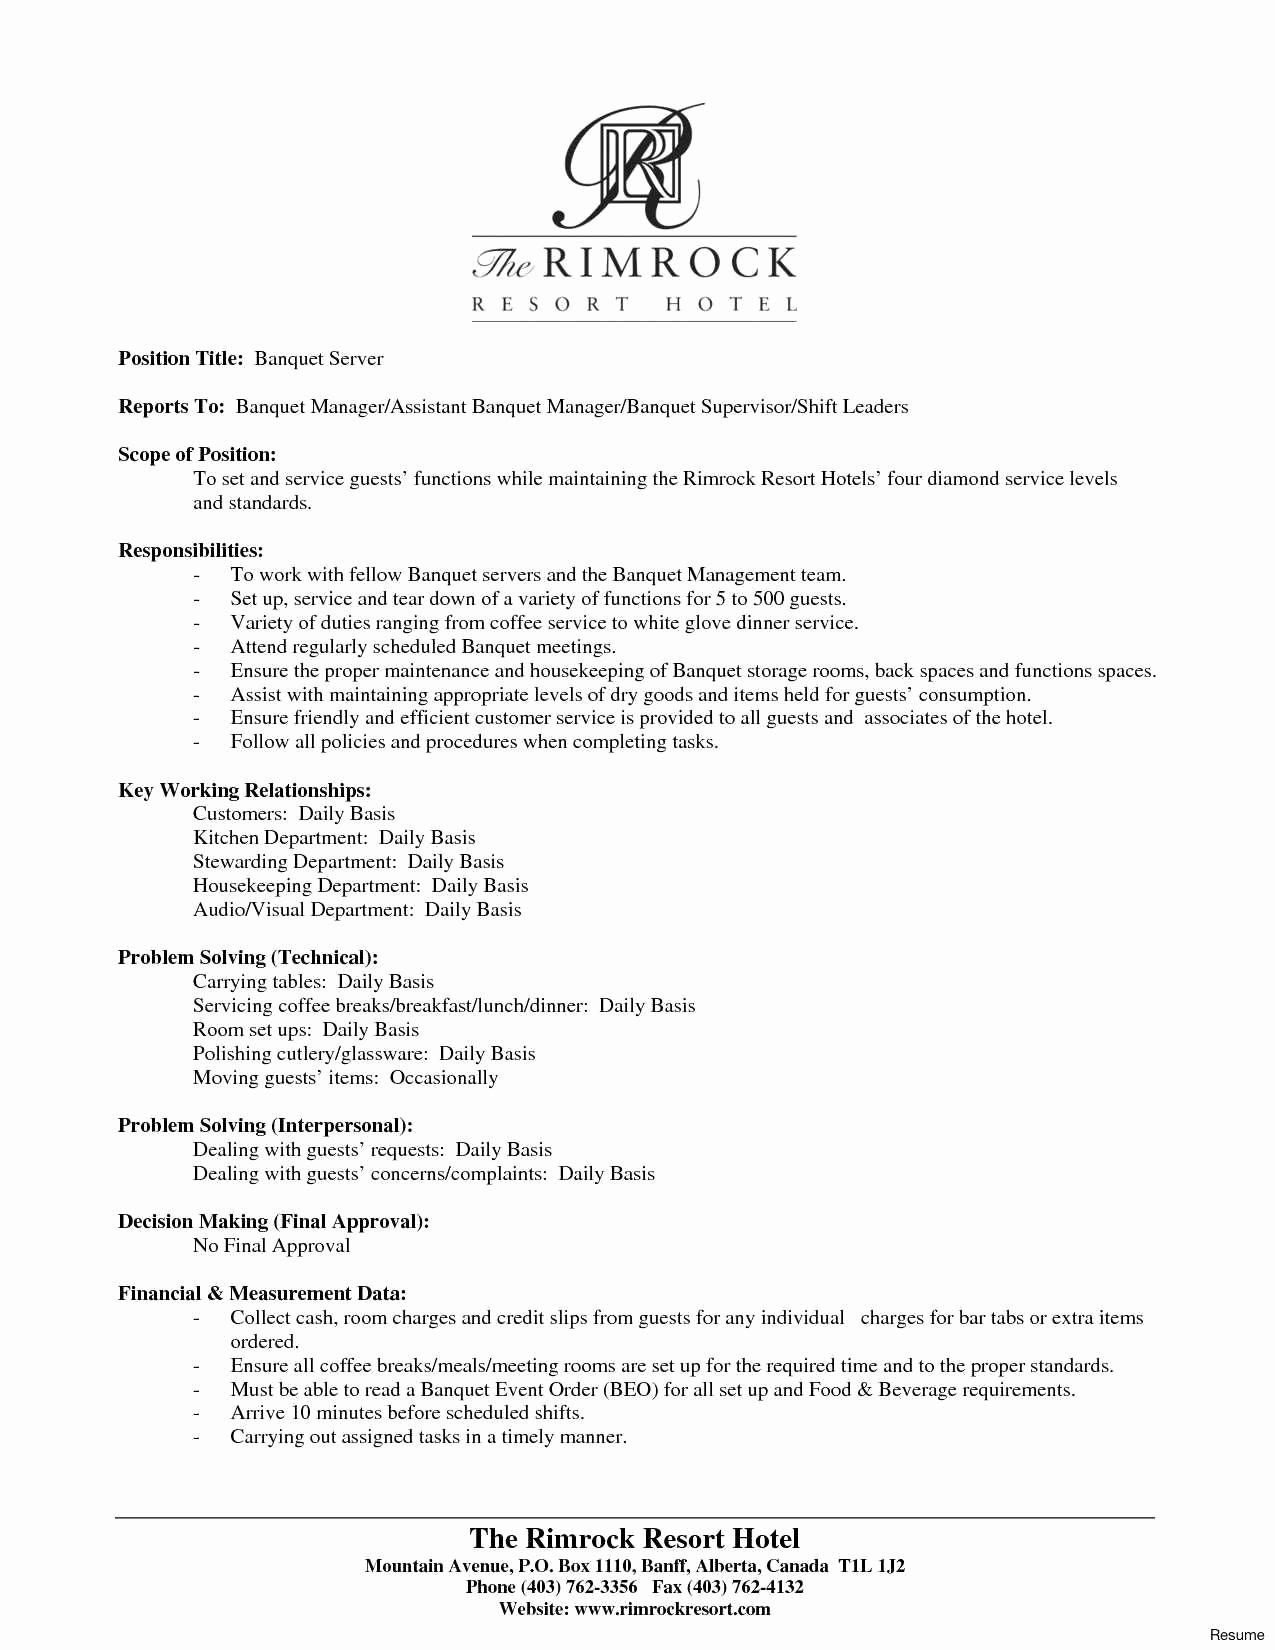 Server Cover Letter Examples New 54 New Image Sample Resume for Restaurant Crew